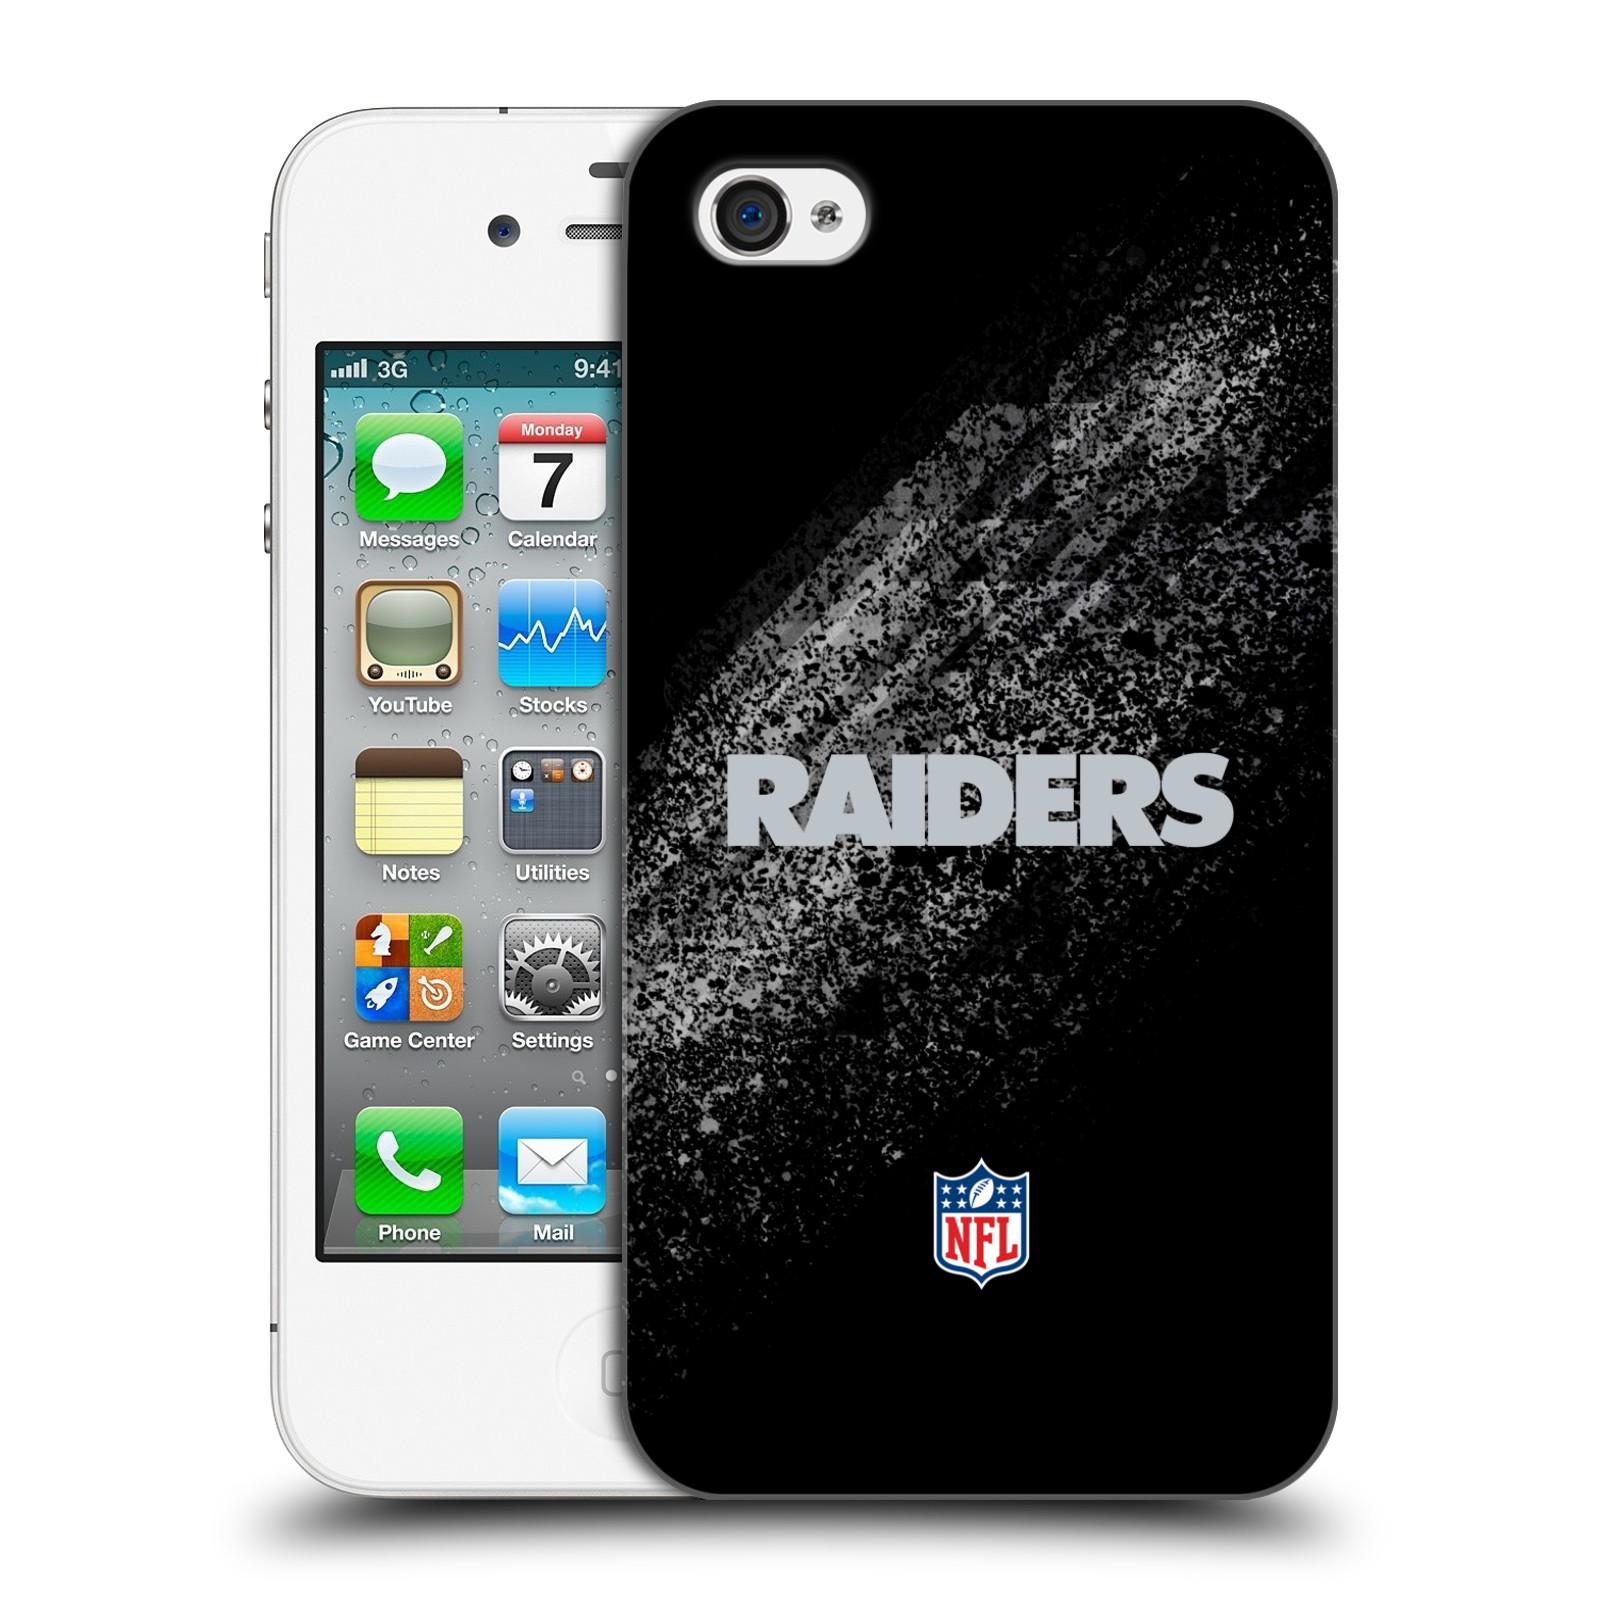 OFFICIAL NFL OAKLAND RAIDERS LOGO HARD BACK CASE FOR APPLE IPHONE PHONES